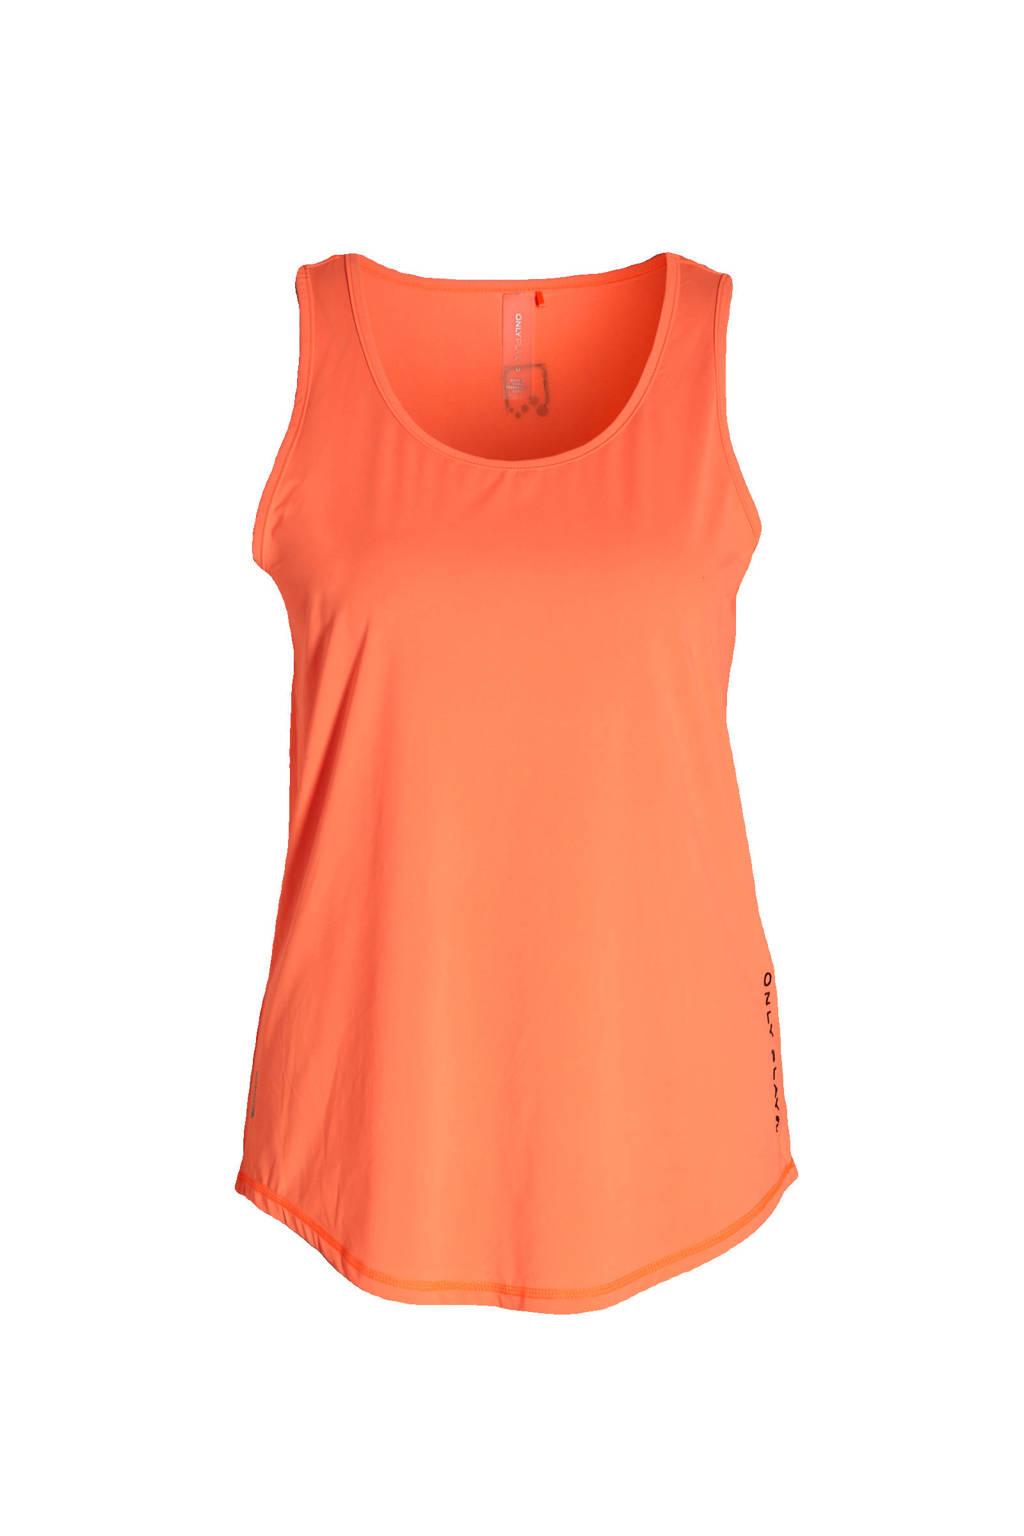 ONLY PLAY sporttop oranje, Oranje